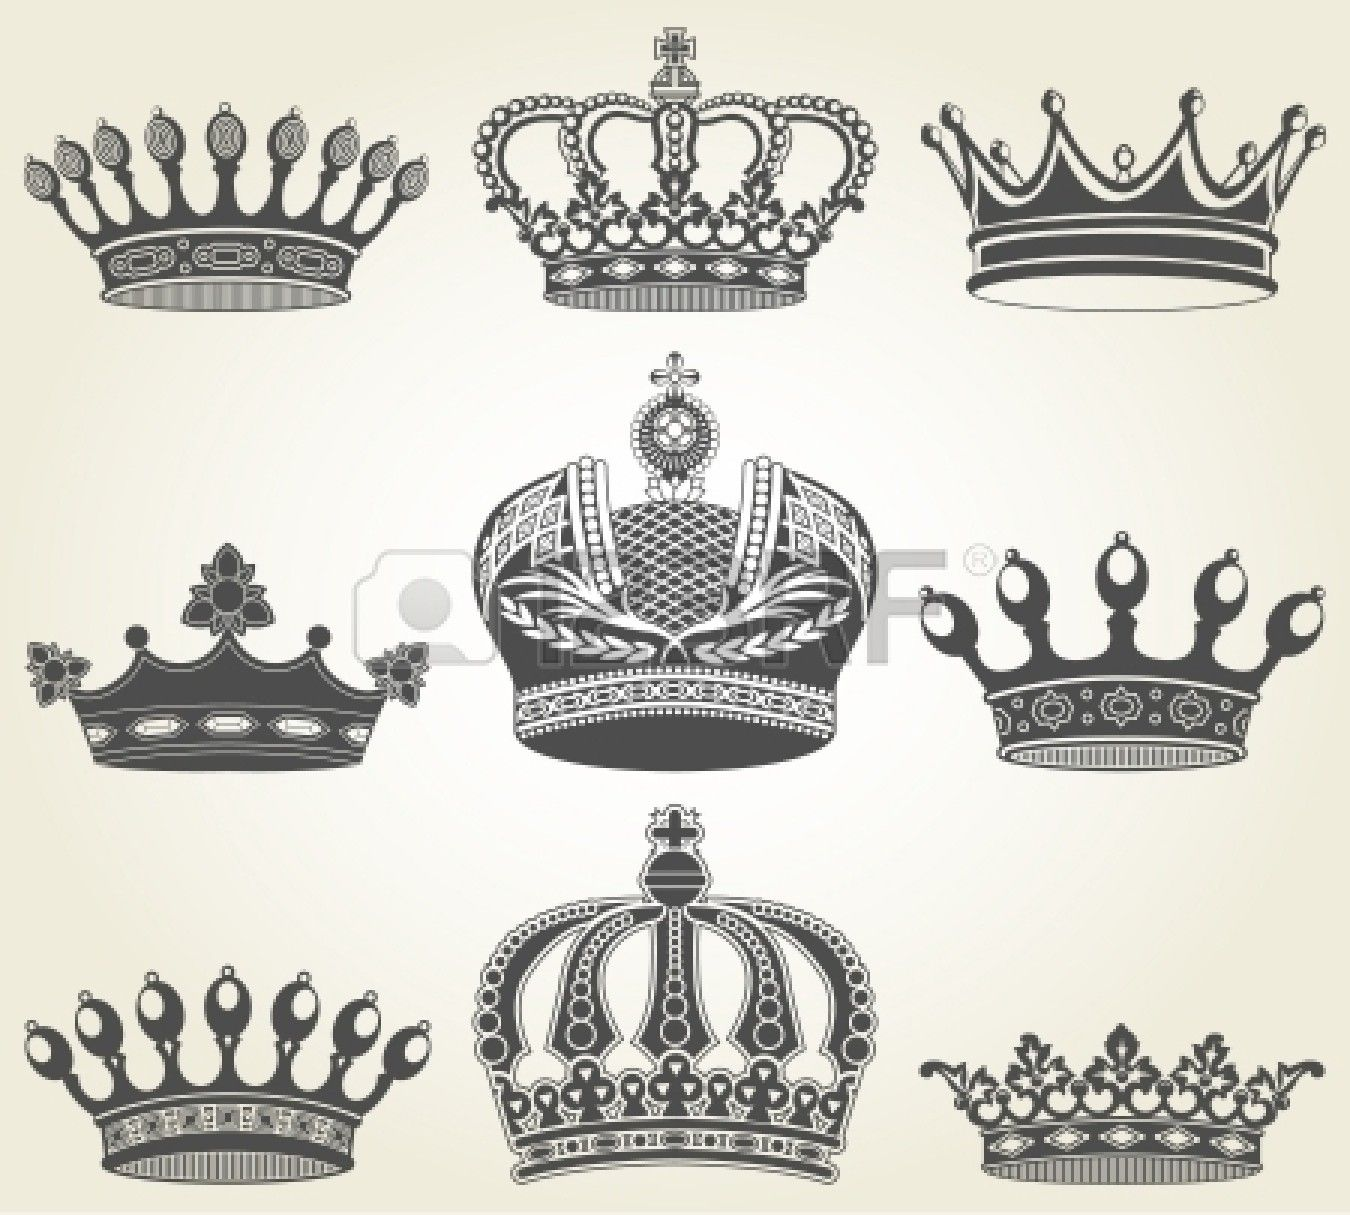 the image set crowns in vintage style graphic design pinterest kronen tattoos tattoo. Black Bedroom Furniture Sets. Home Design Ideas